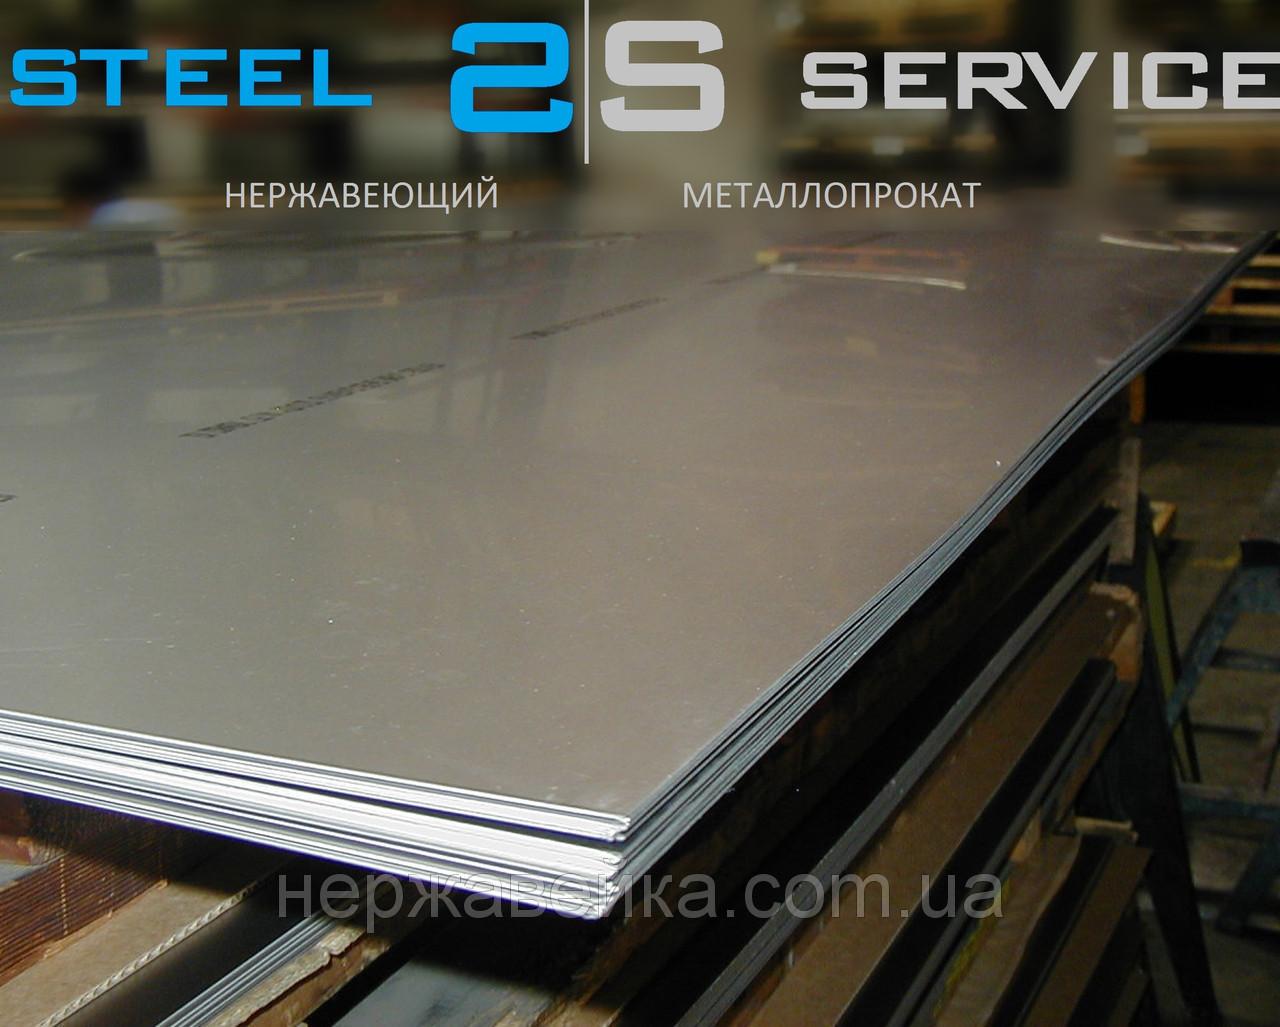 Нержавейка лист 6х1000х2000мм  AISI 316L(03Х17Н14М3) F1 - горячекатанный,  кислотостойкий